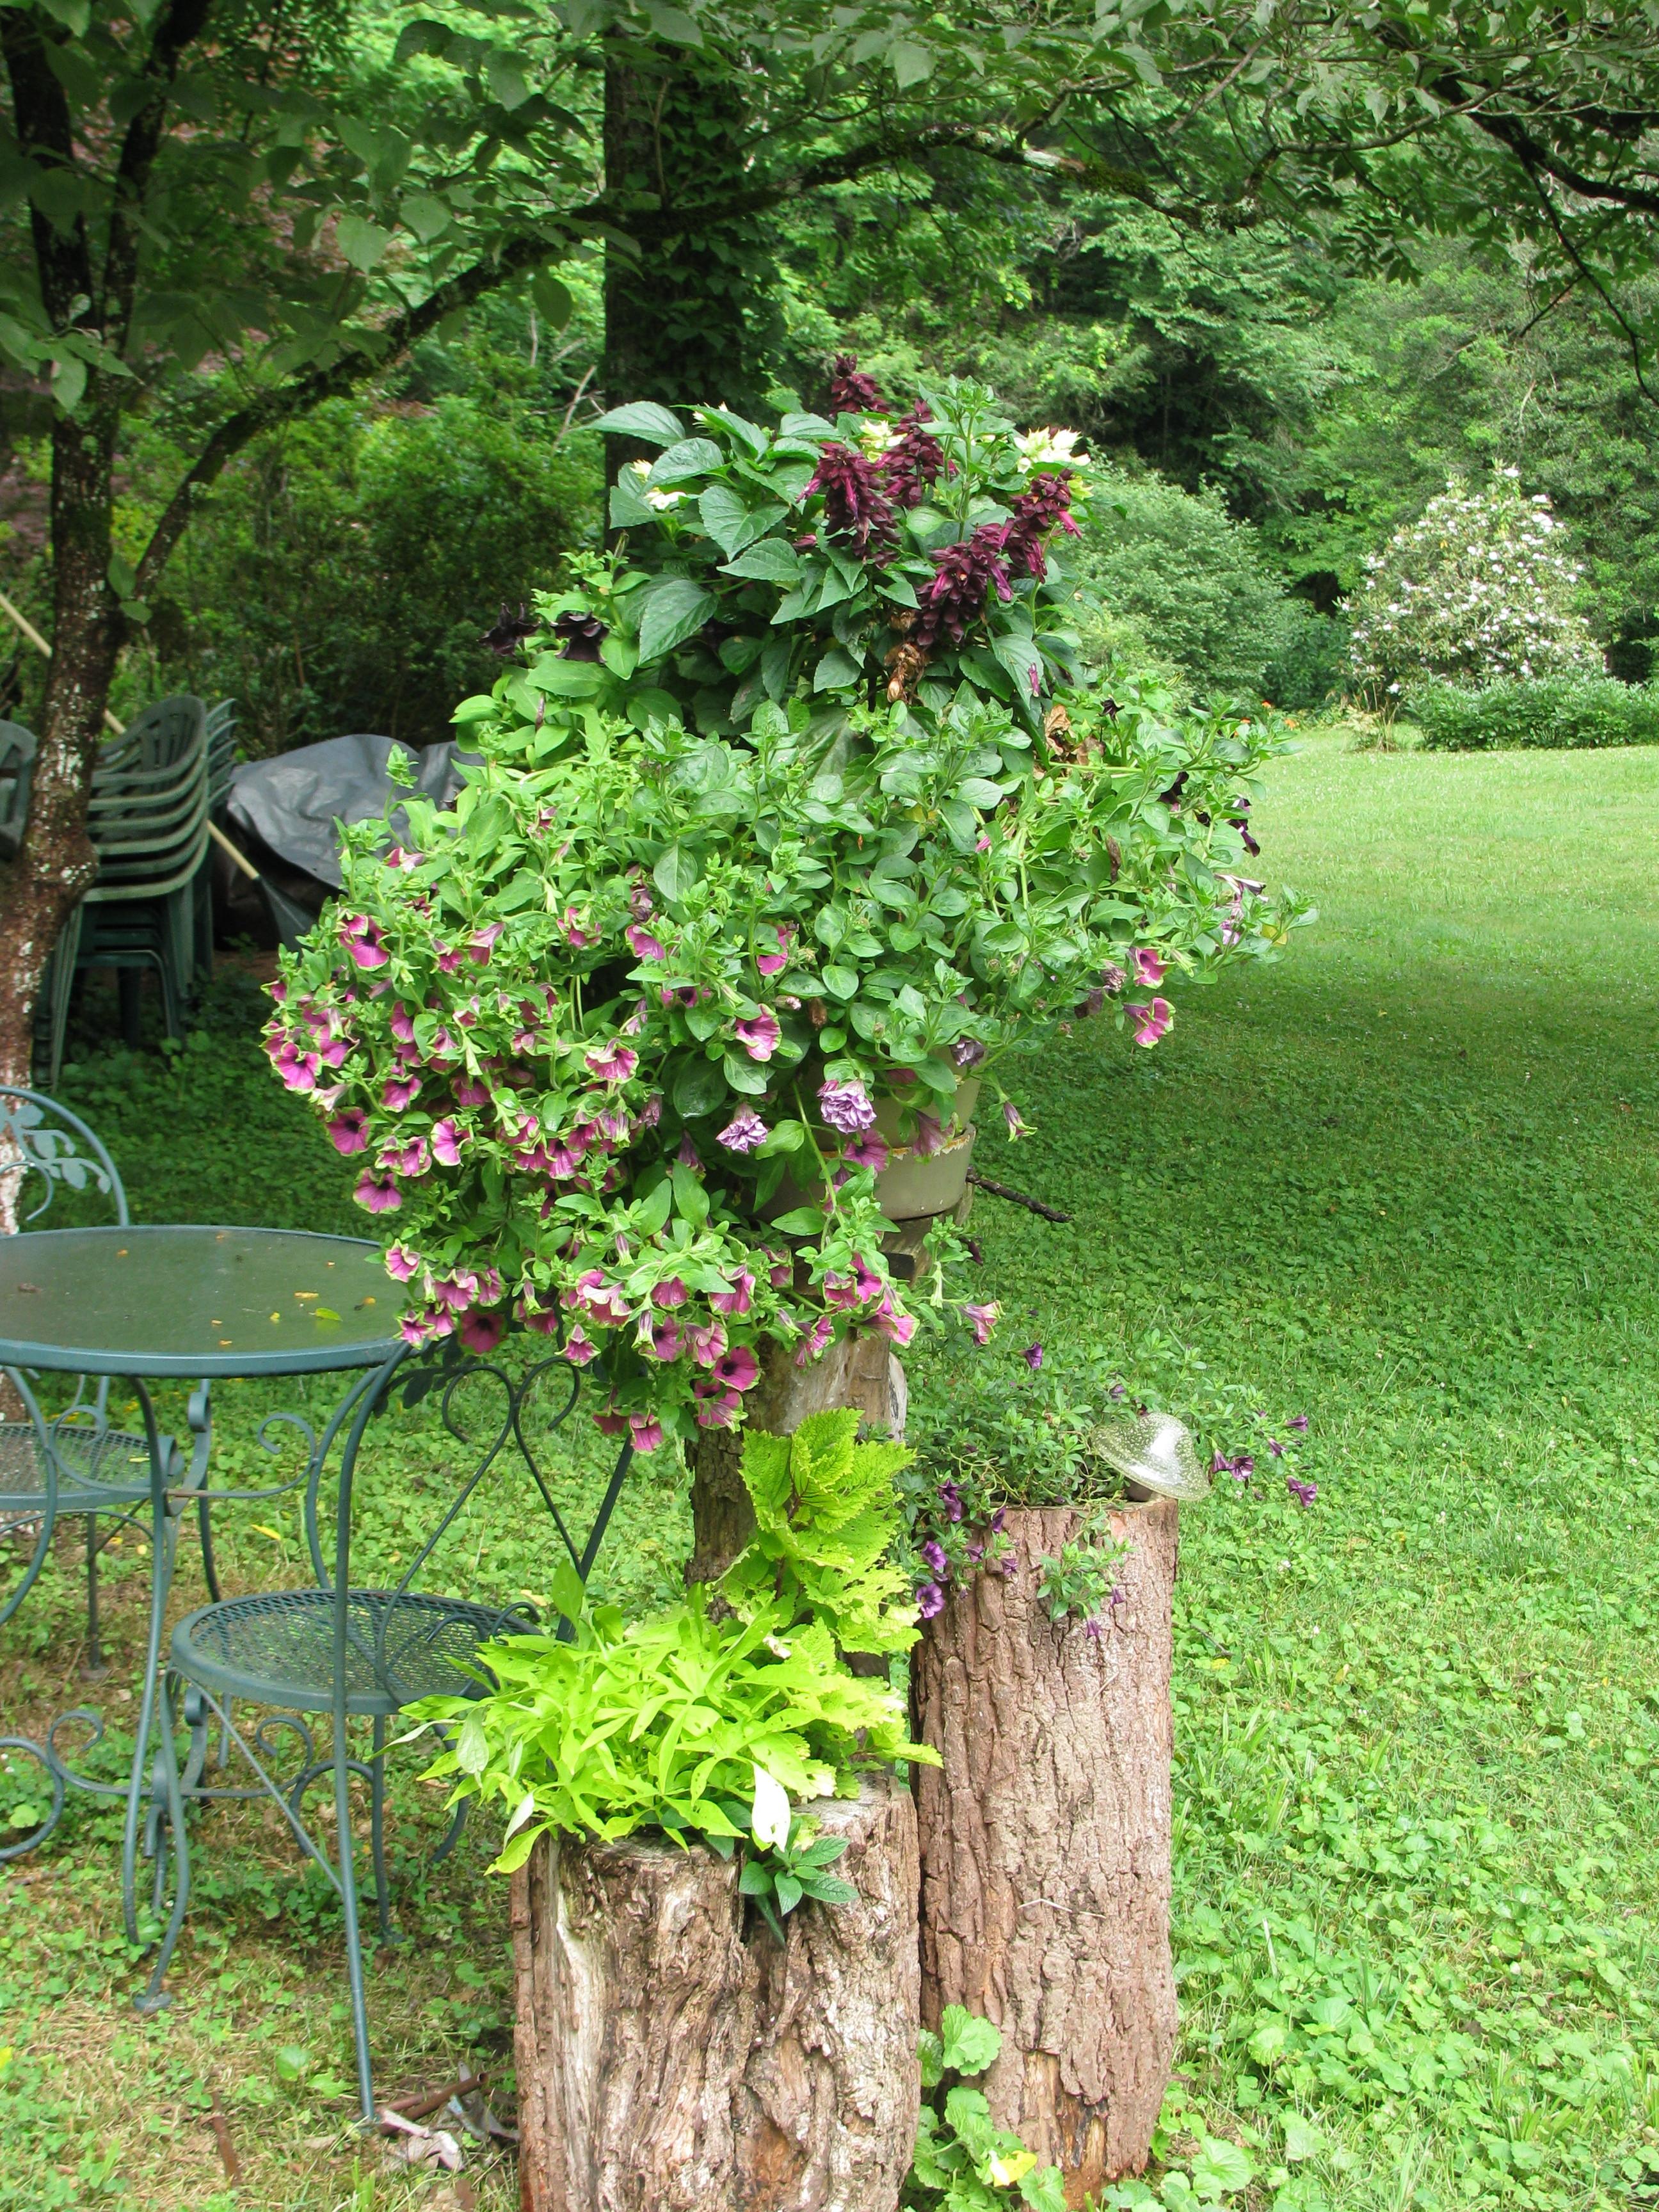 Logs jack spratt 39 s garden - Container gardens for shade ...